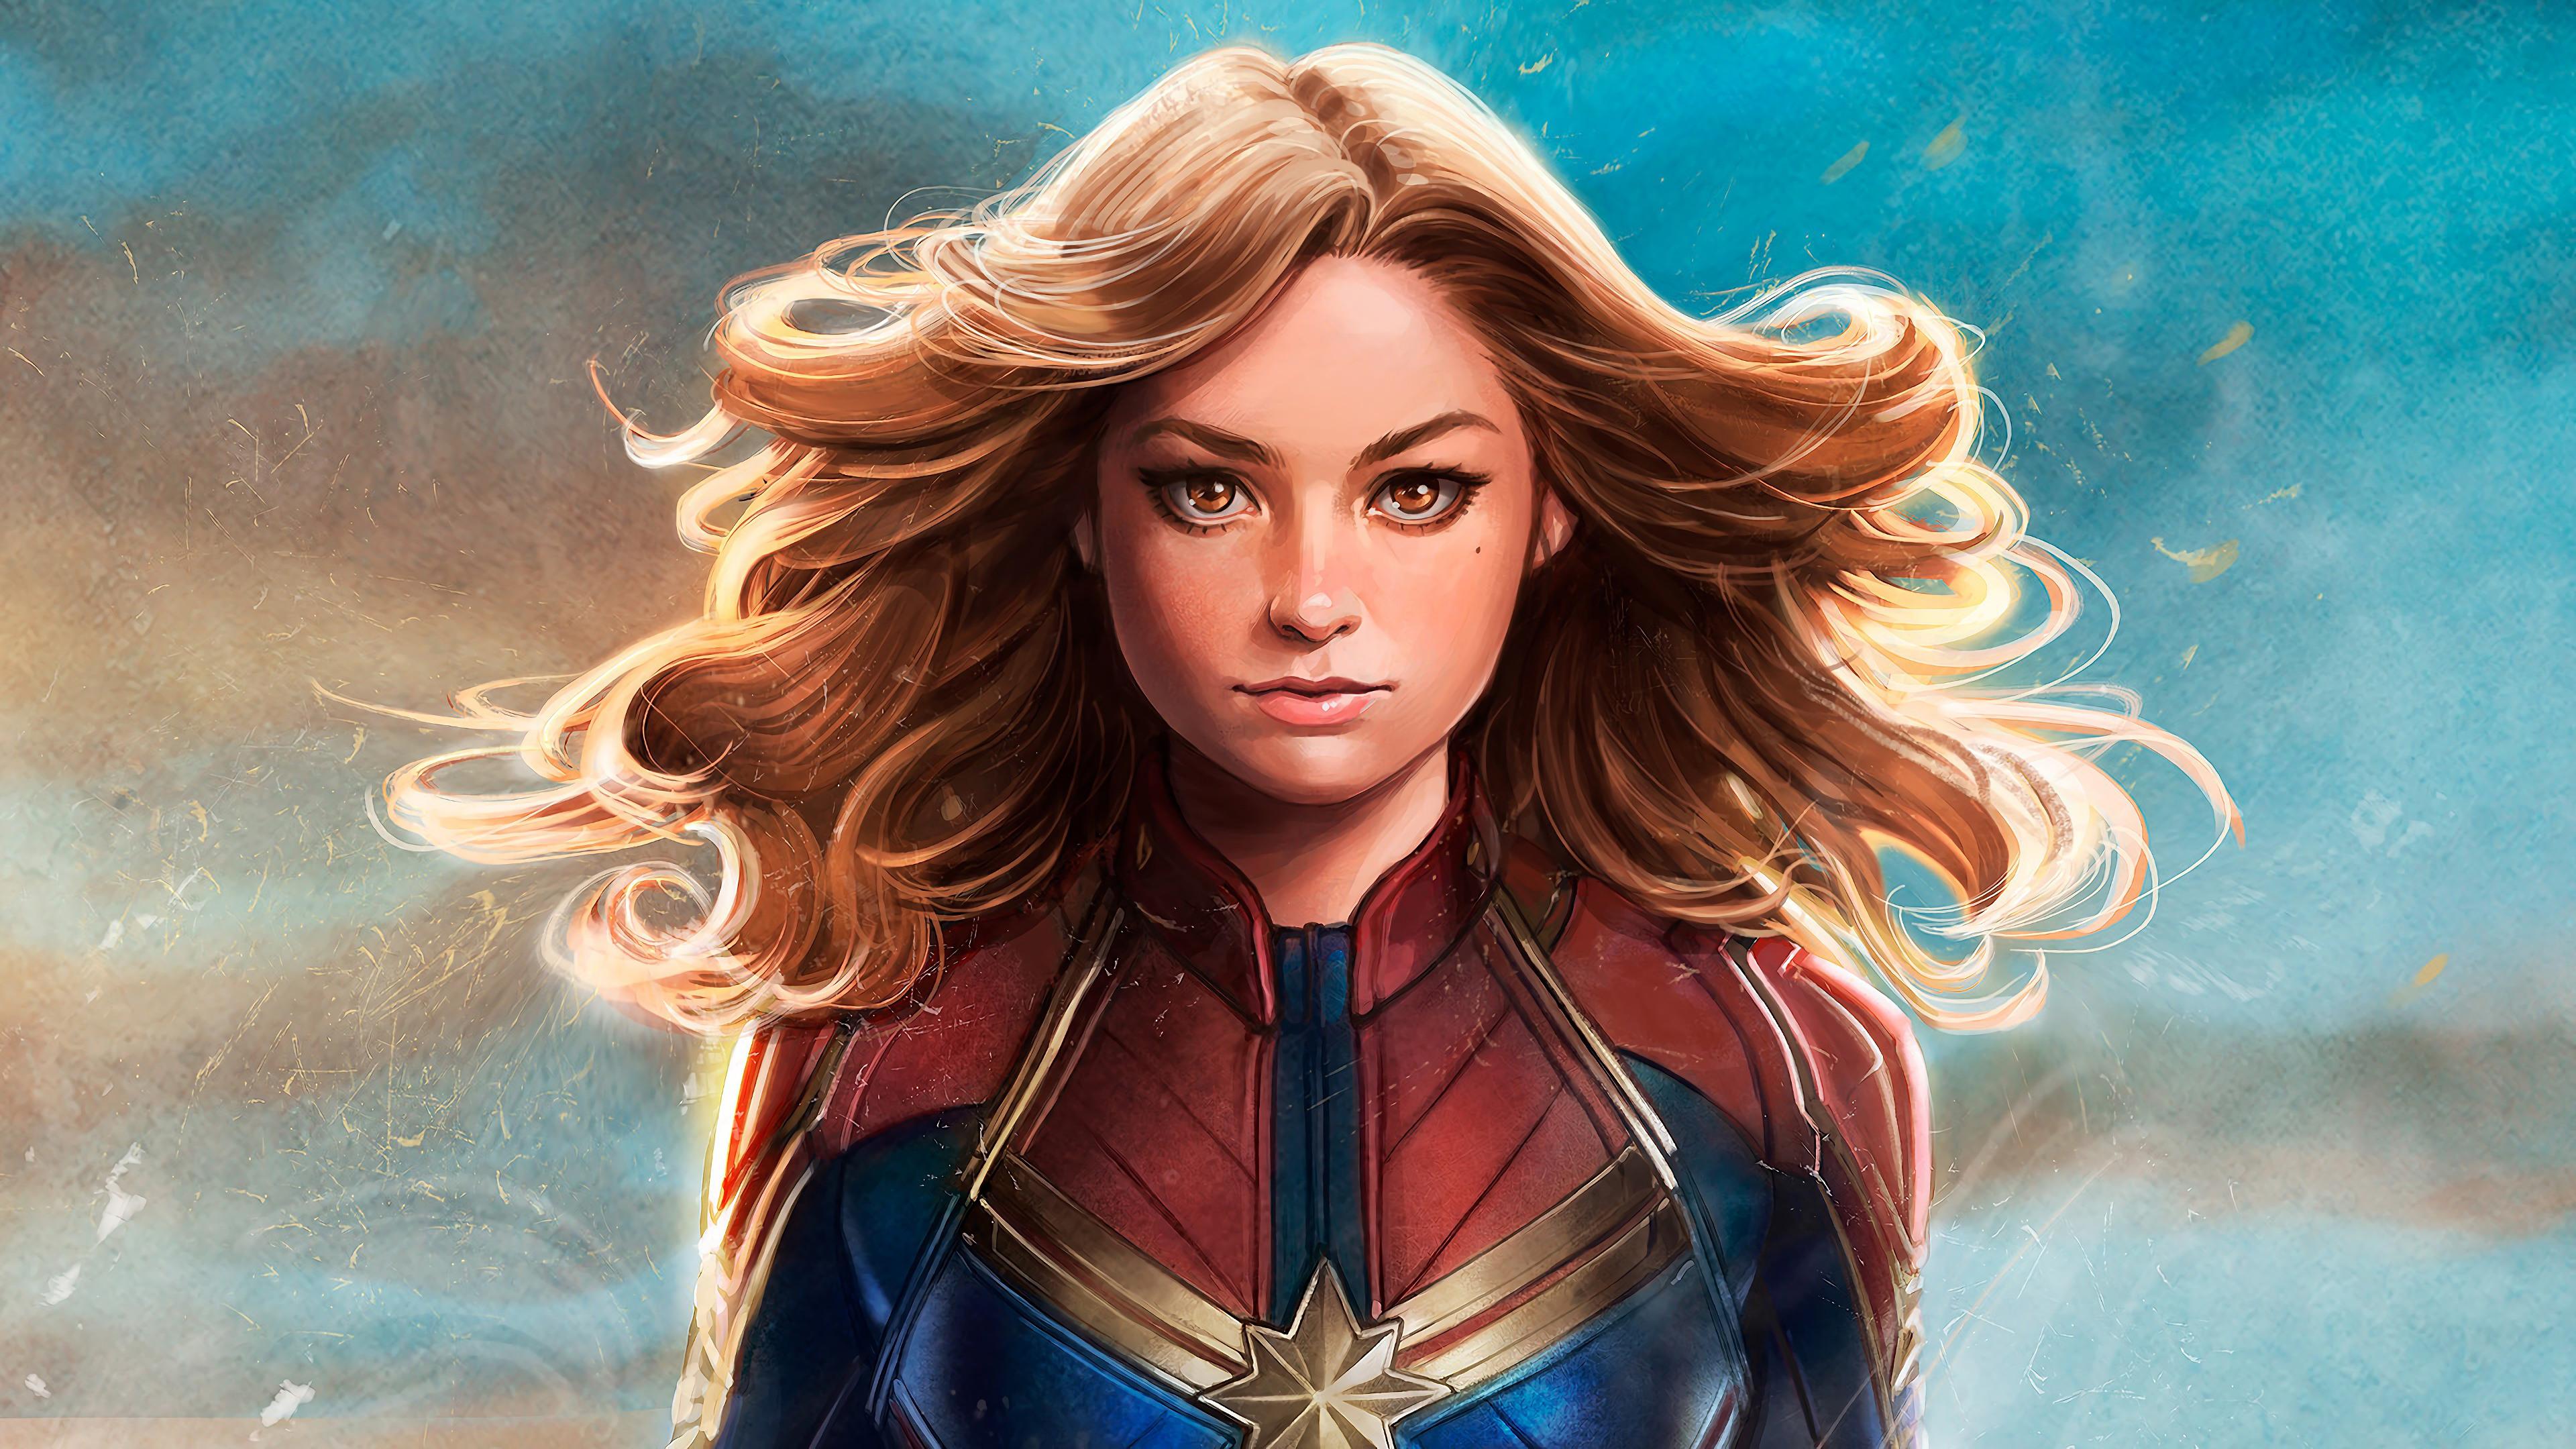 captain marvel movie 2019 carol danvers 4k wallpaper 1544829313 - Captain Marvel Movie 2019 Carol Danvers 4K Wallpaper - Marvel Comics, Captain Marvel (Movie 2019), Captain Marvel (Carol Danvers)